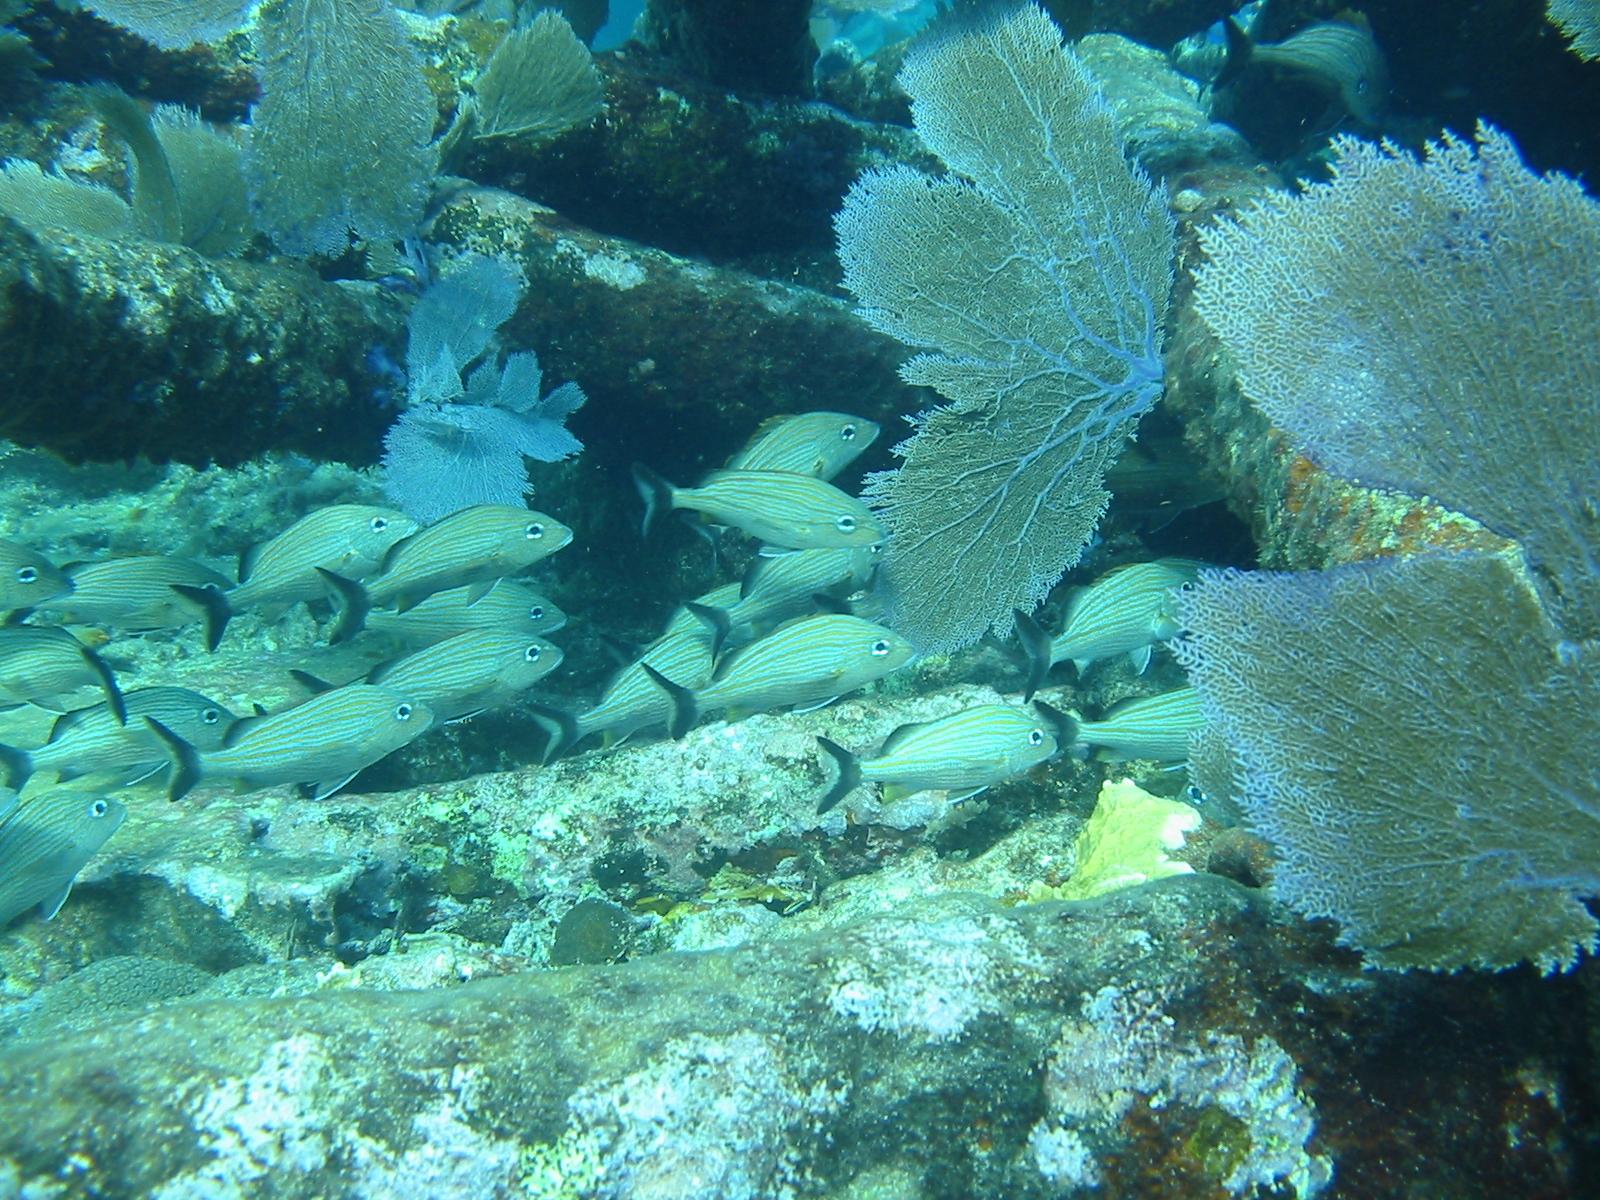 /cms/uploads/image/file/320567/Ecosistemas_marinos2.jpg